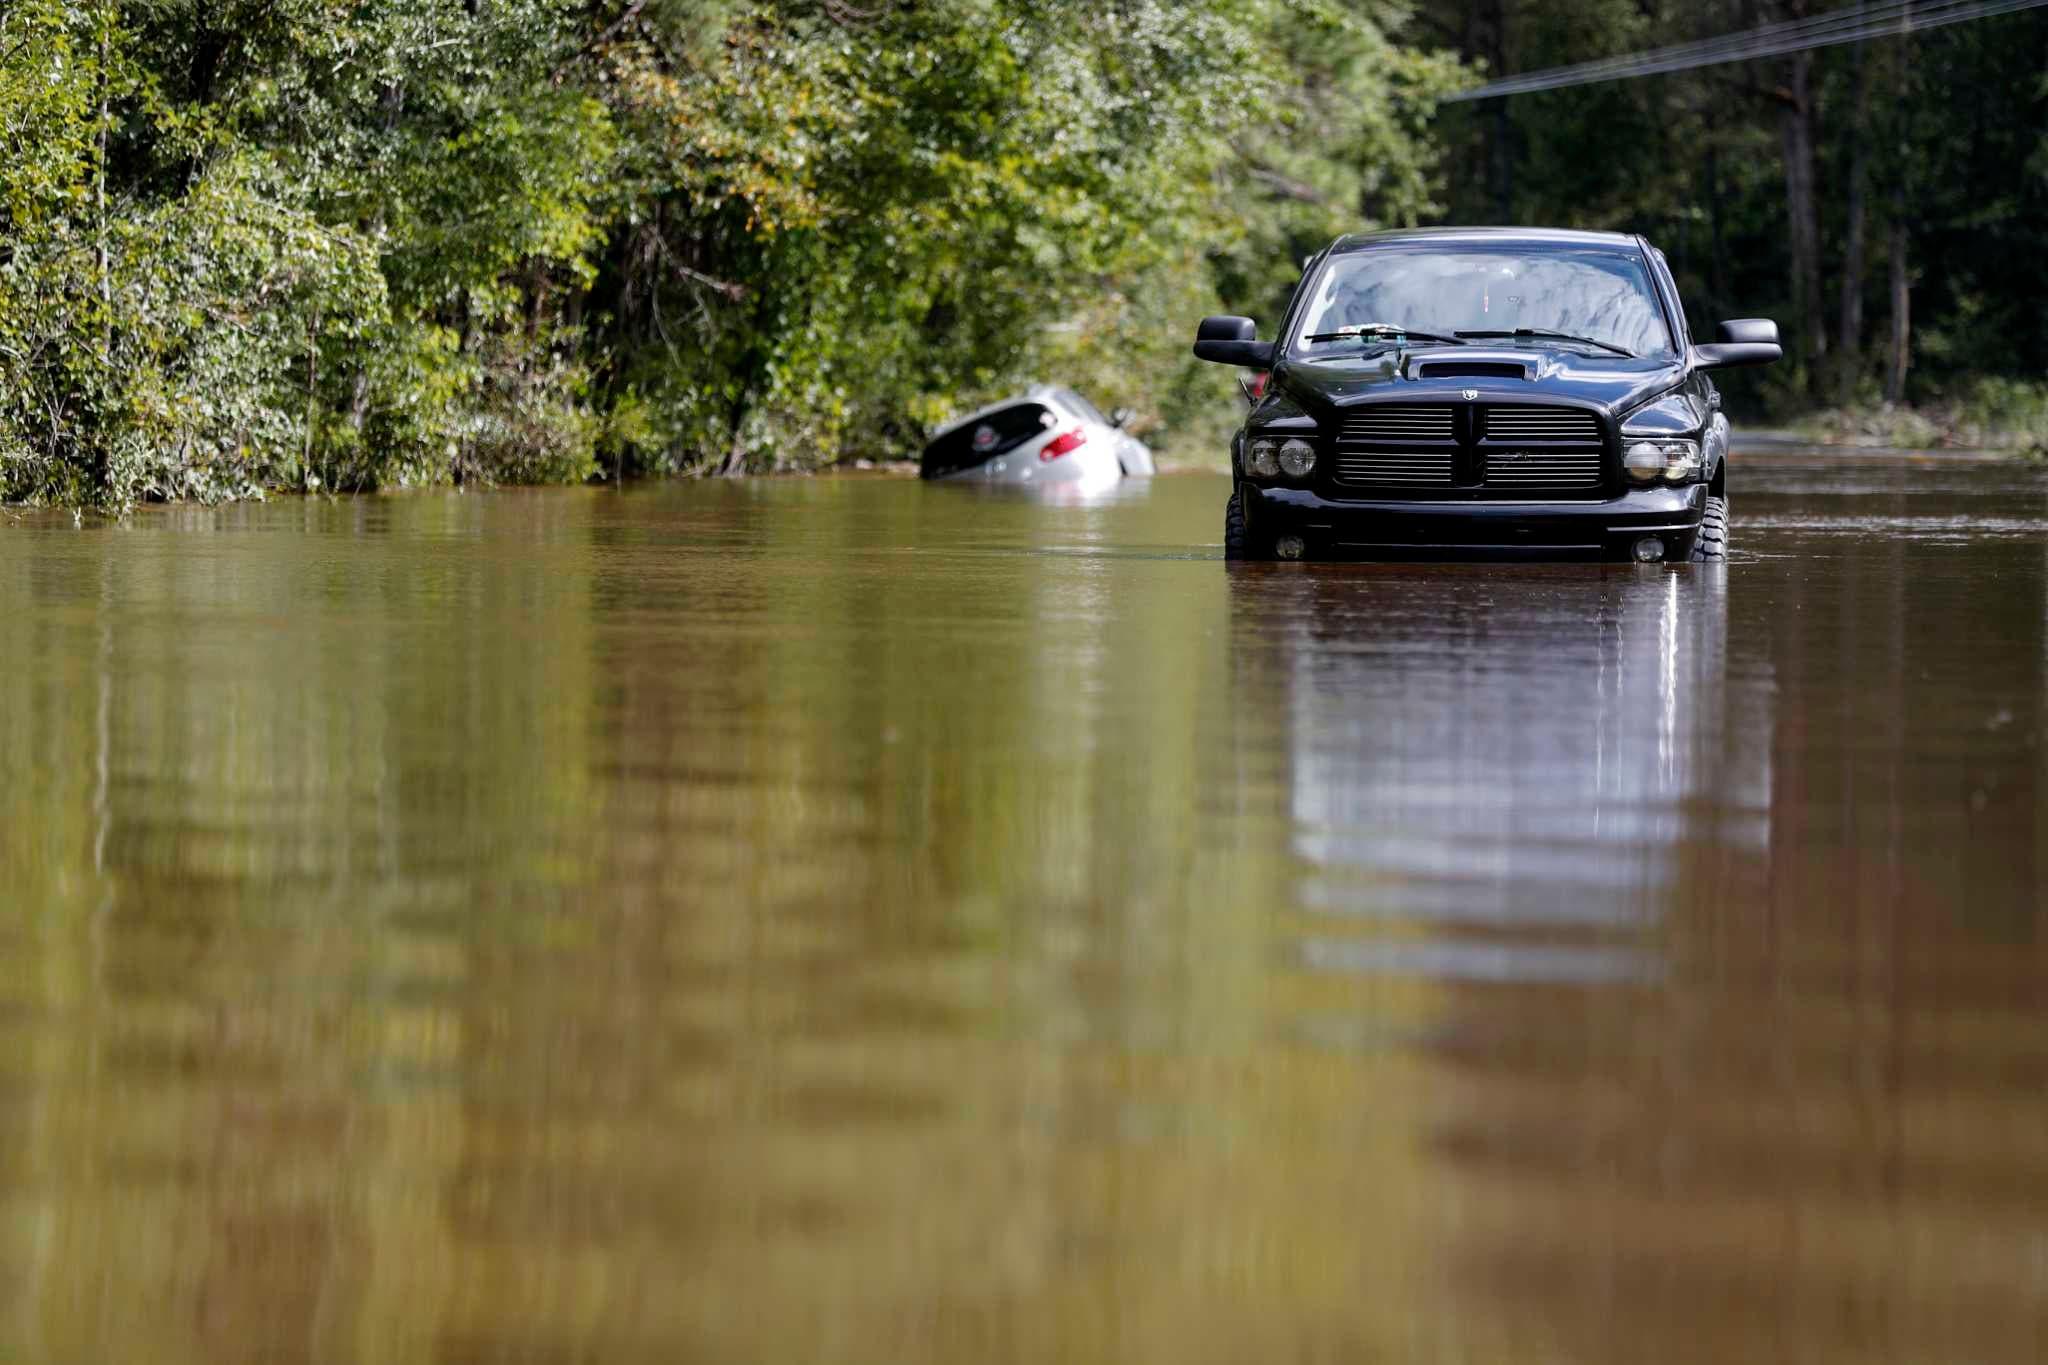 Piden paciencia a personas afectadas por el huracán Florence